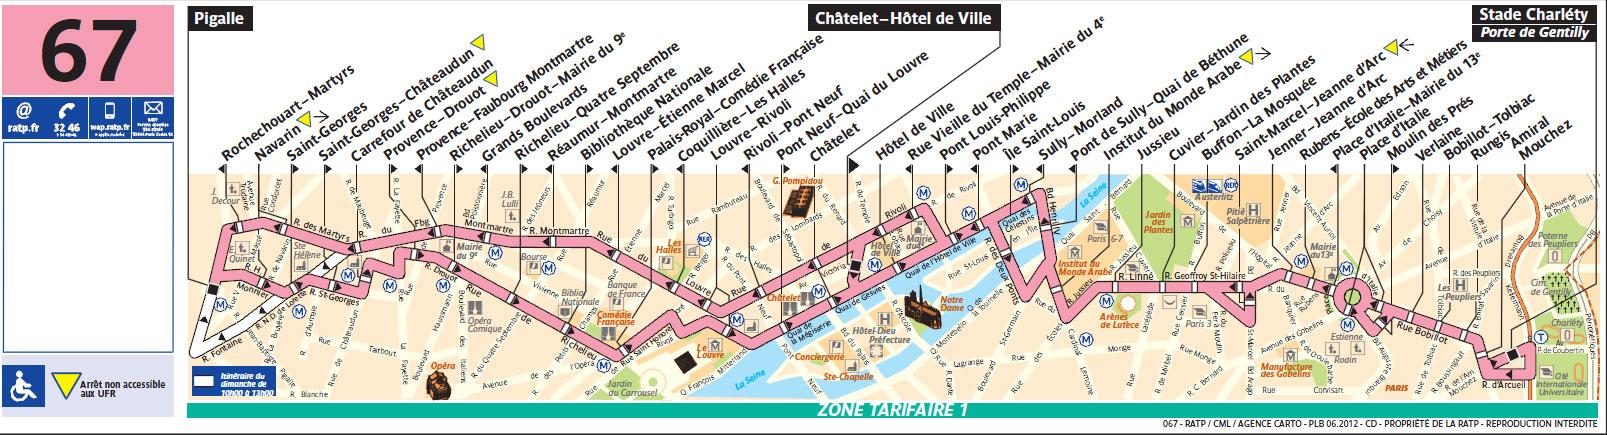 Hotel De France Gare De L Est